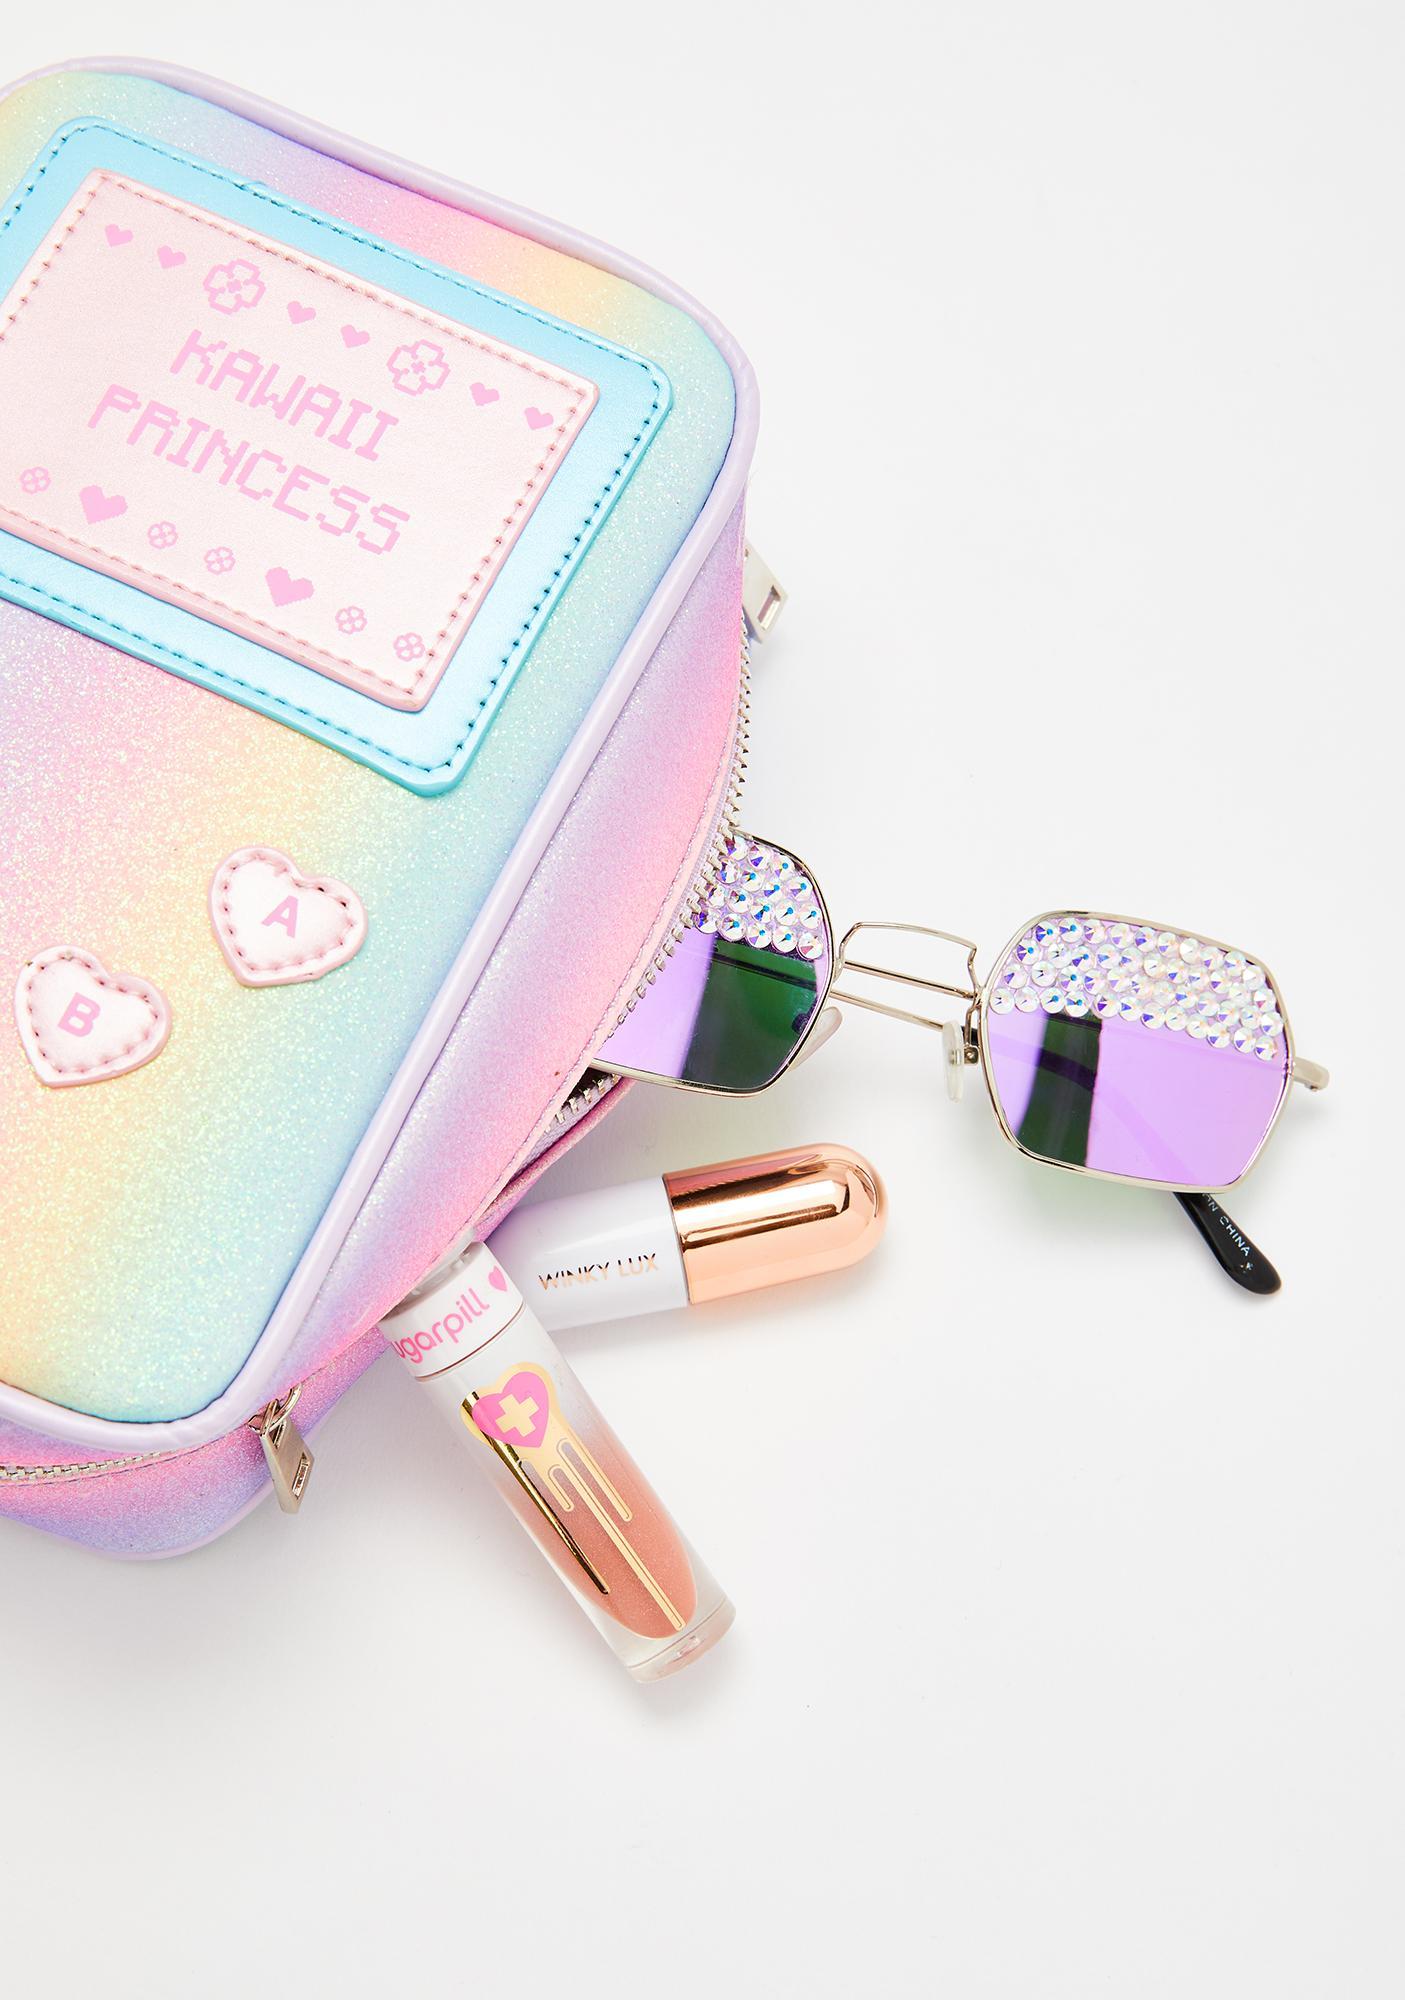 Sugar Thrillz Gamer Girl Makeup Bag